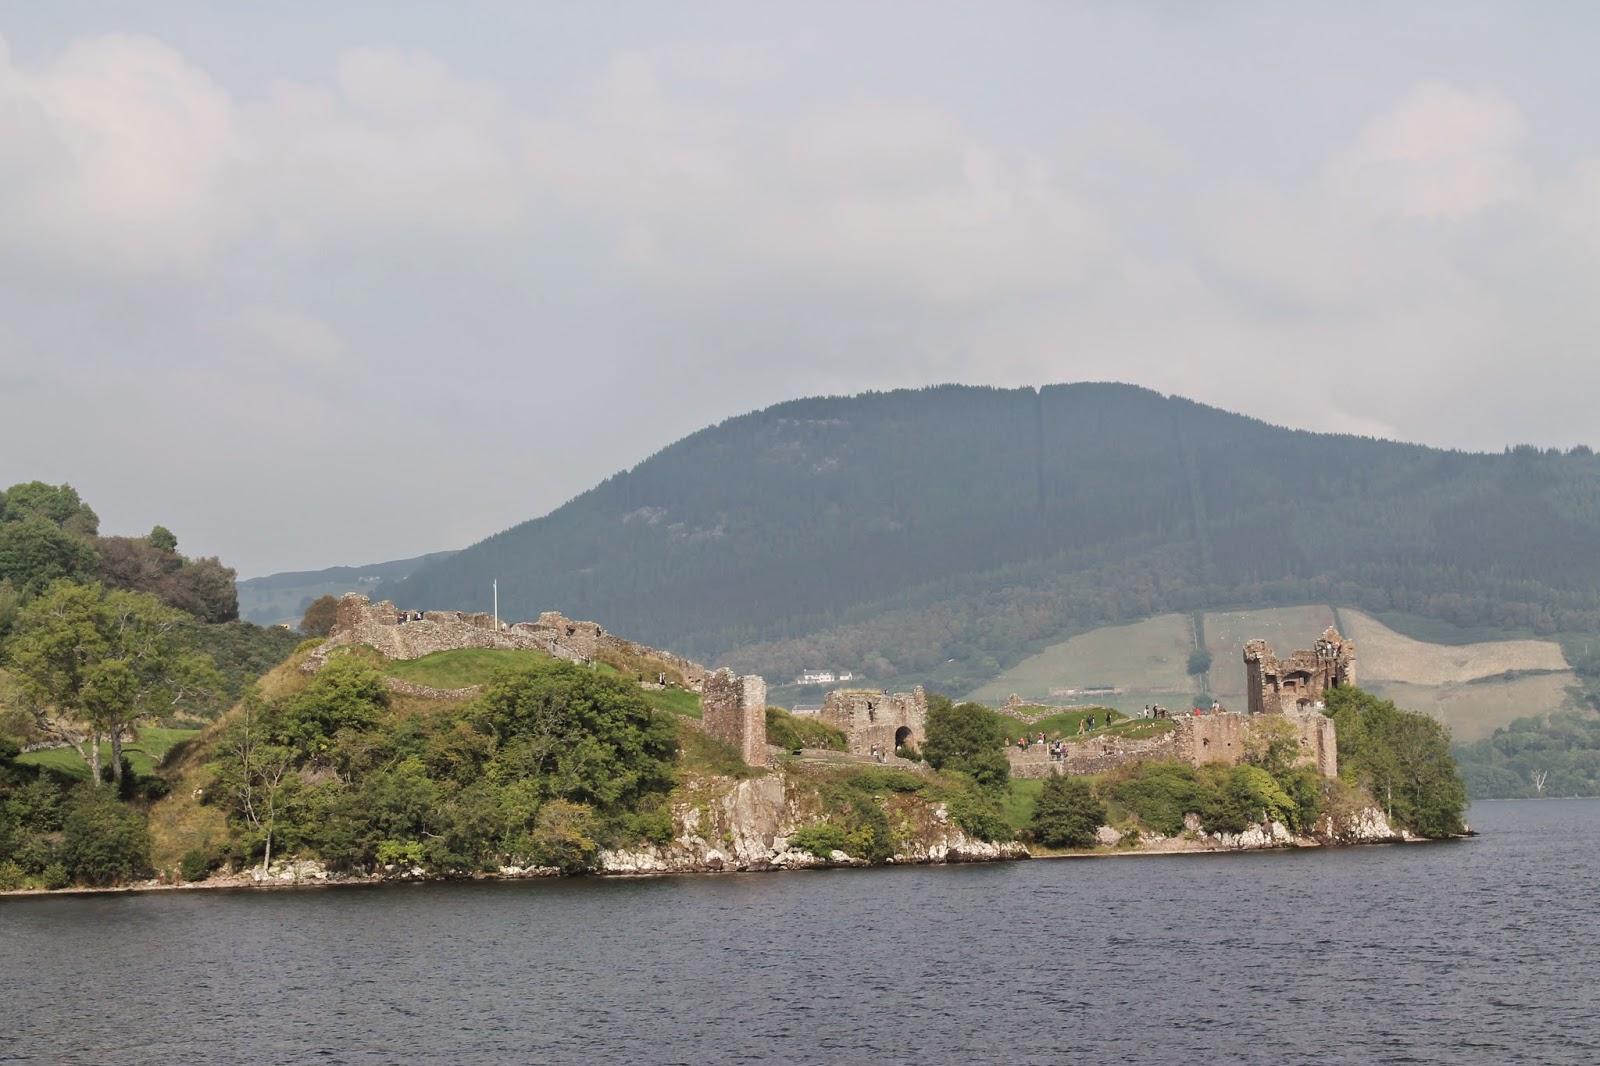 Loch Ness The Touristic Lens